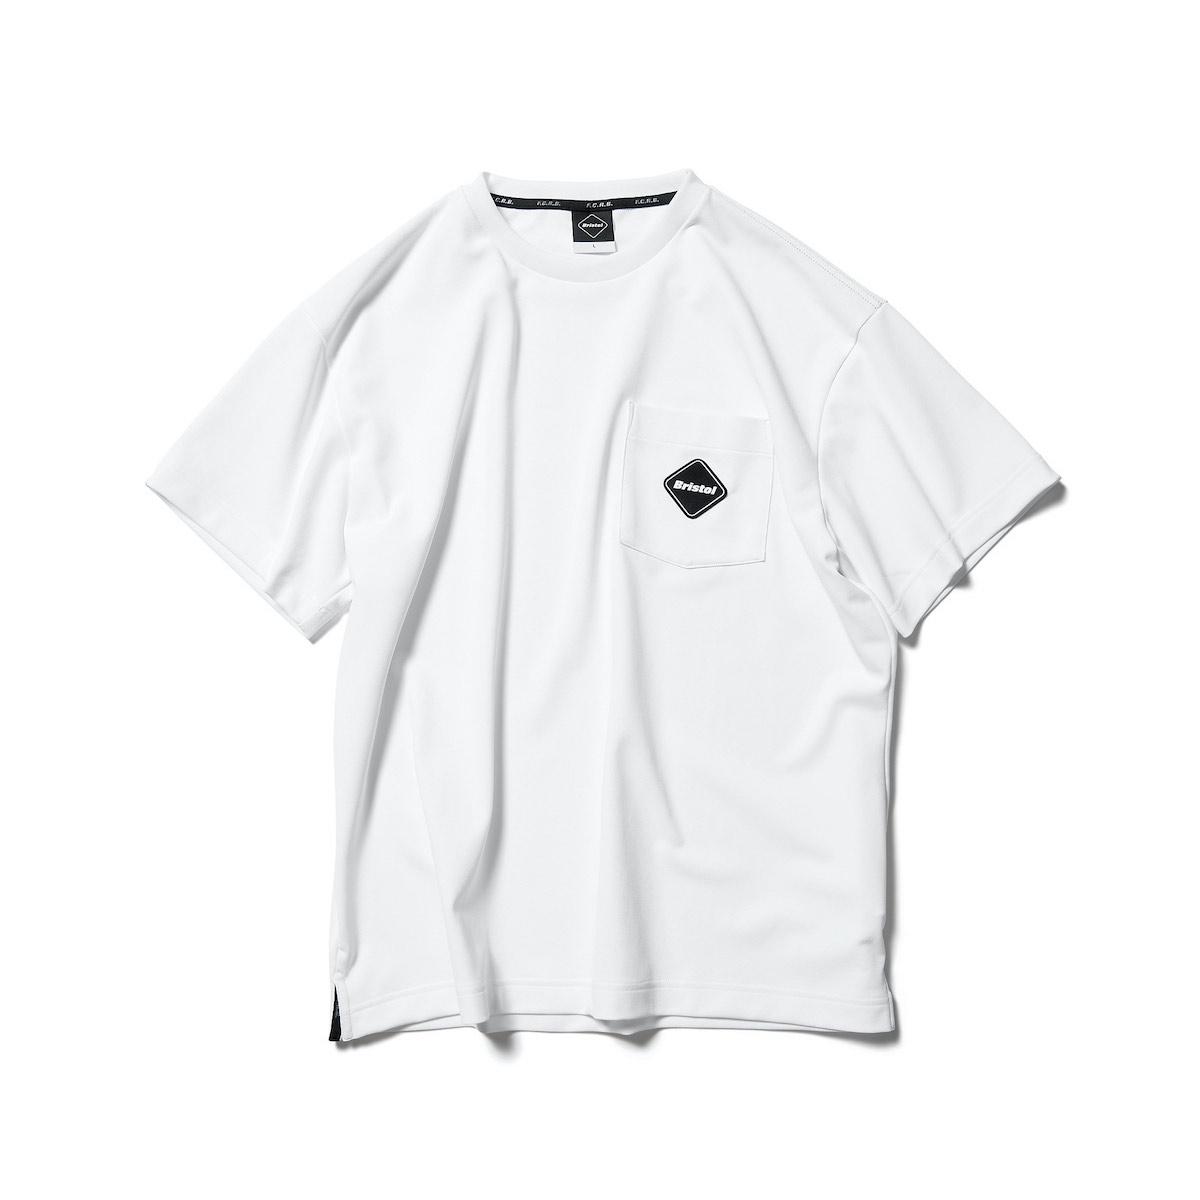 F.C.Real Bristol / SEED STITCH POCKET TEE (White)正面